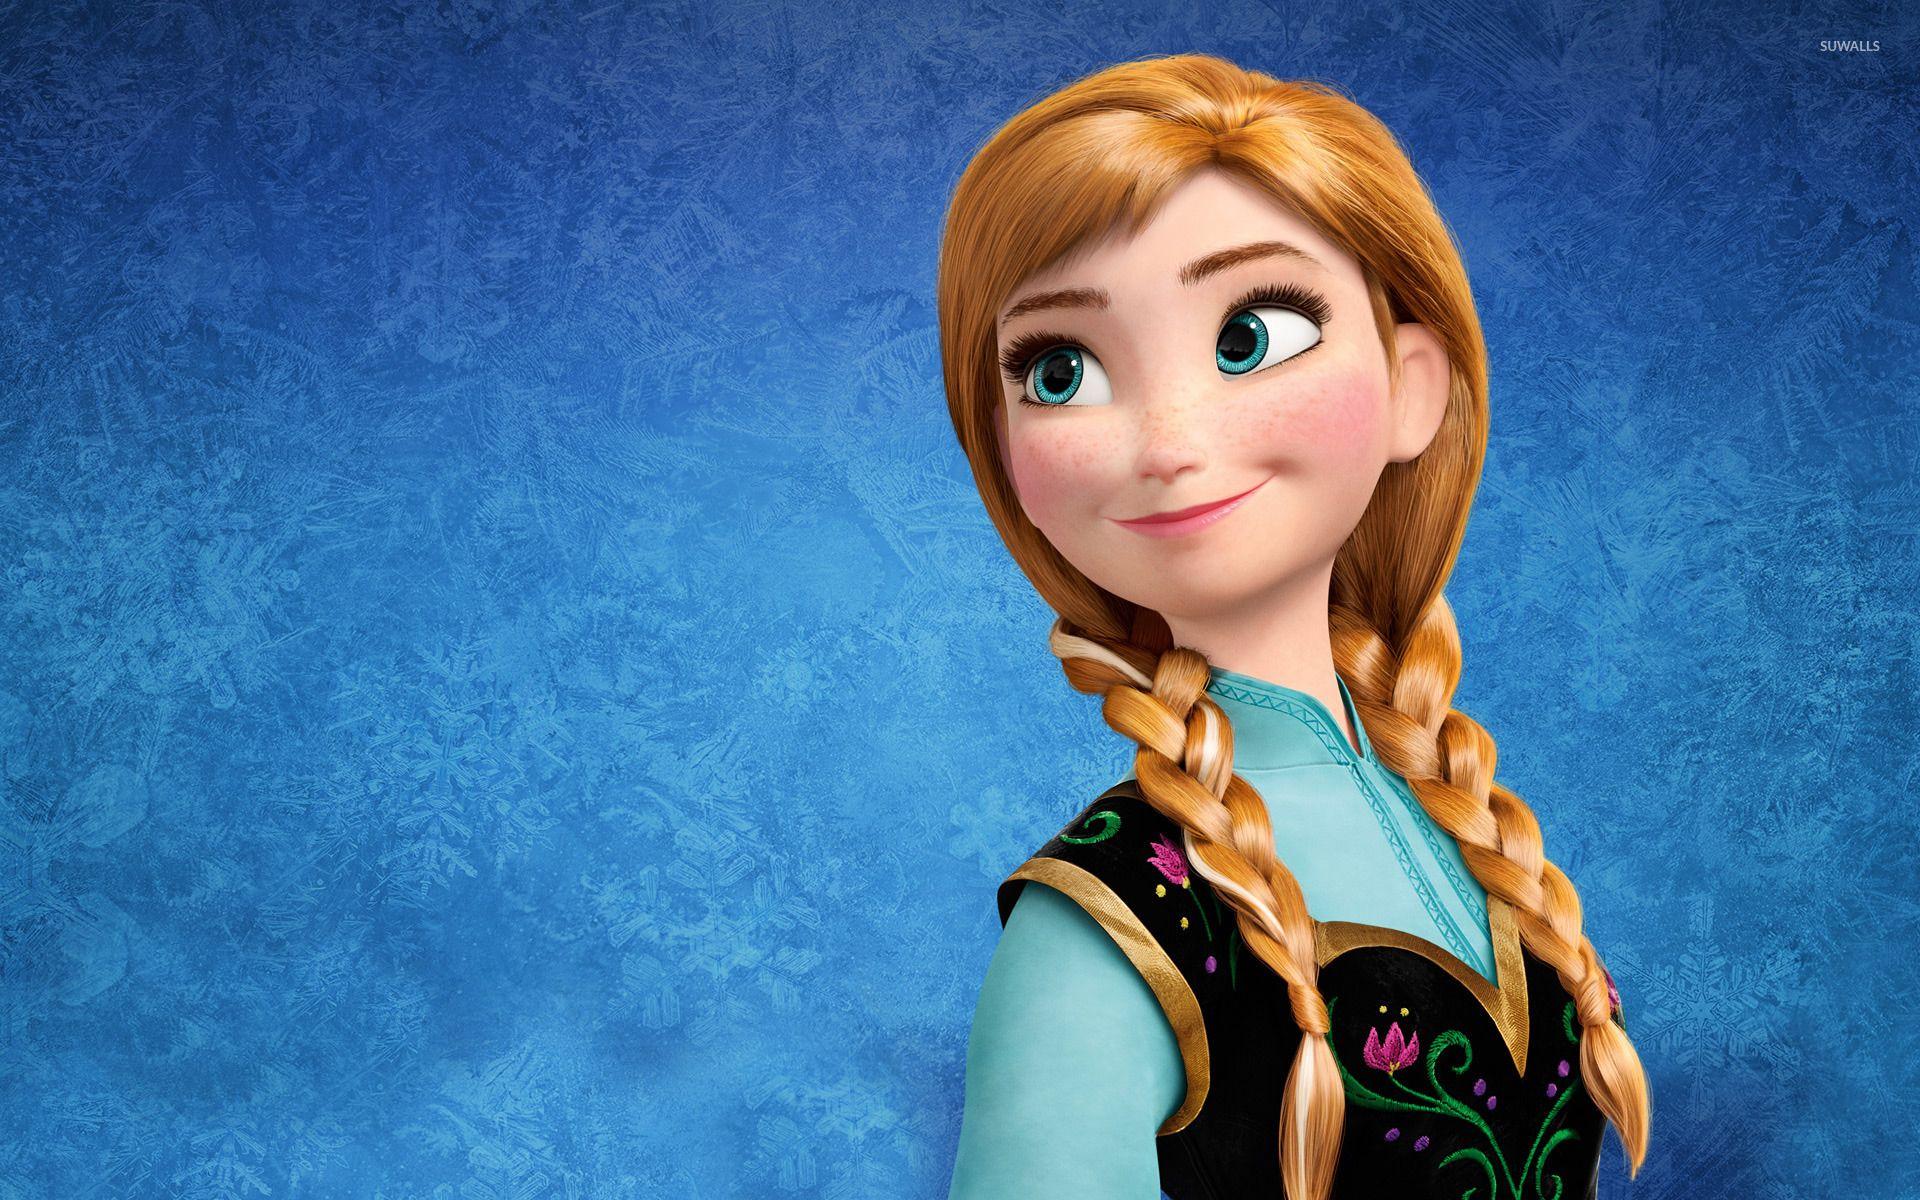 Elsa frozen wallpapers hd hd wallpapers pinterest elsa elsa frozen wallpapers hd voltagebd Gallery